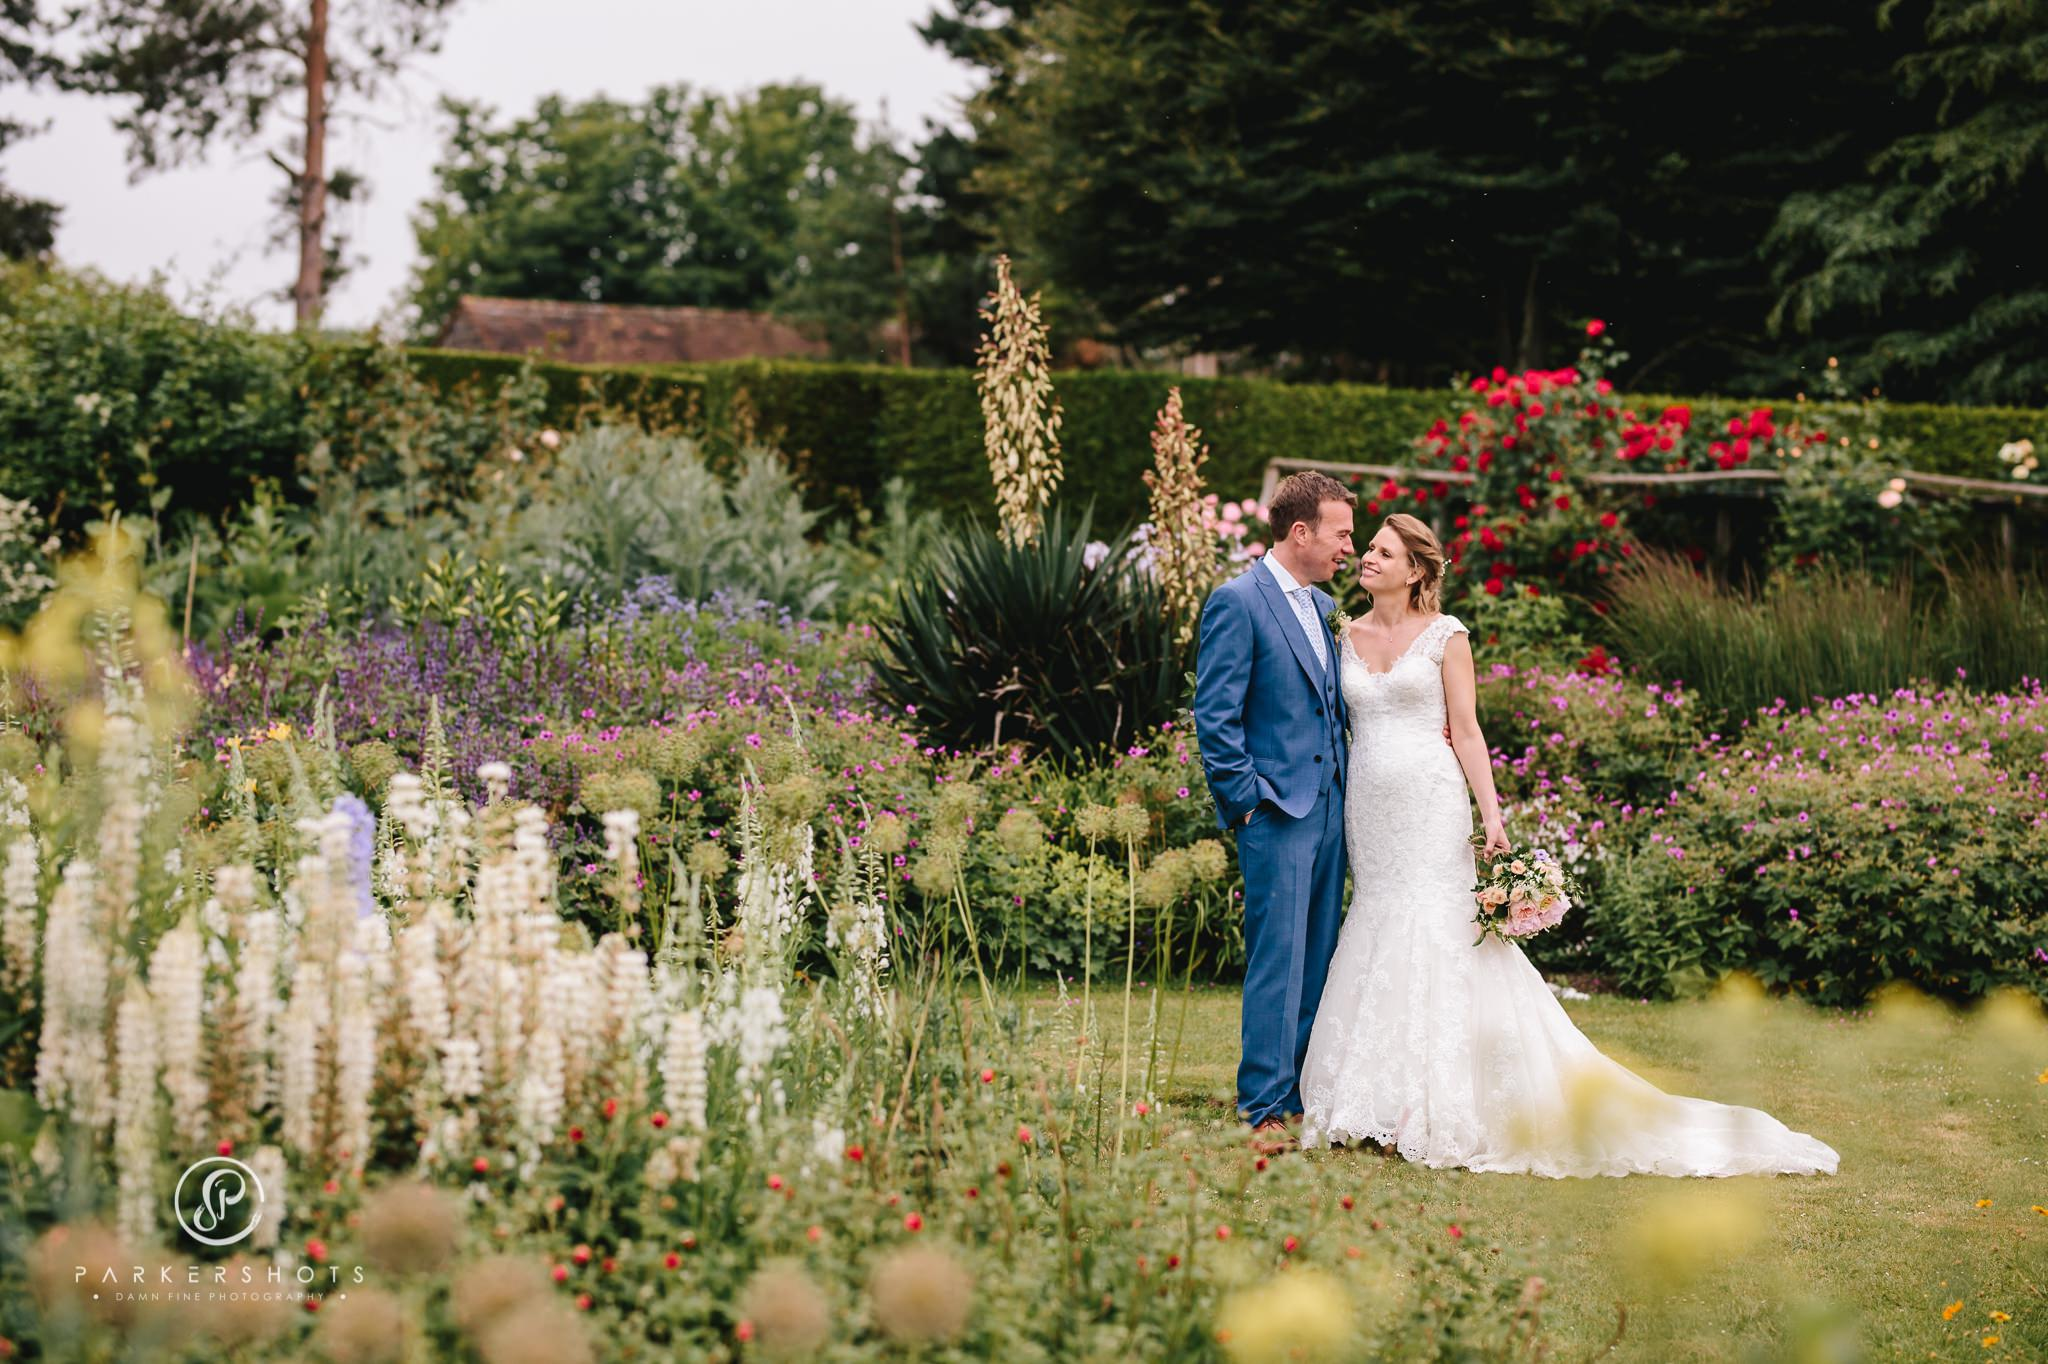 Nettlestead Place wedding photographer photo of bride and groom